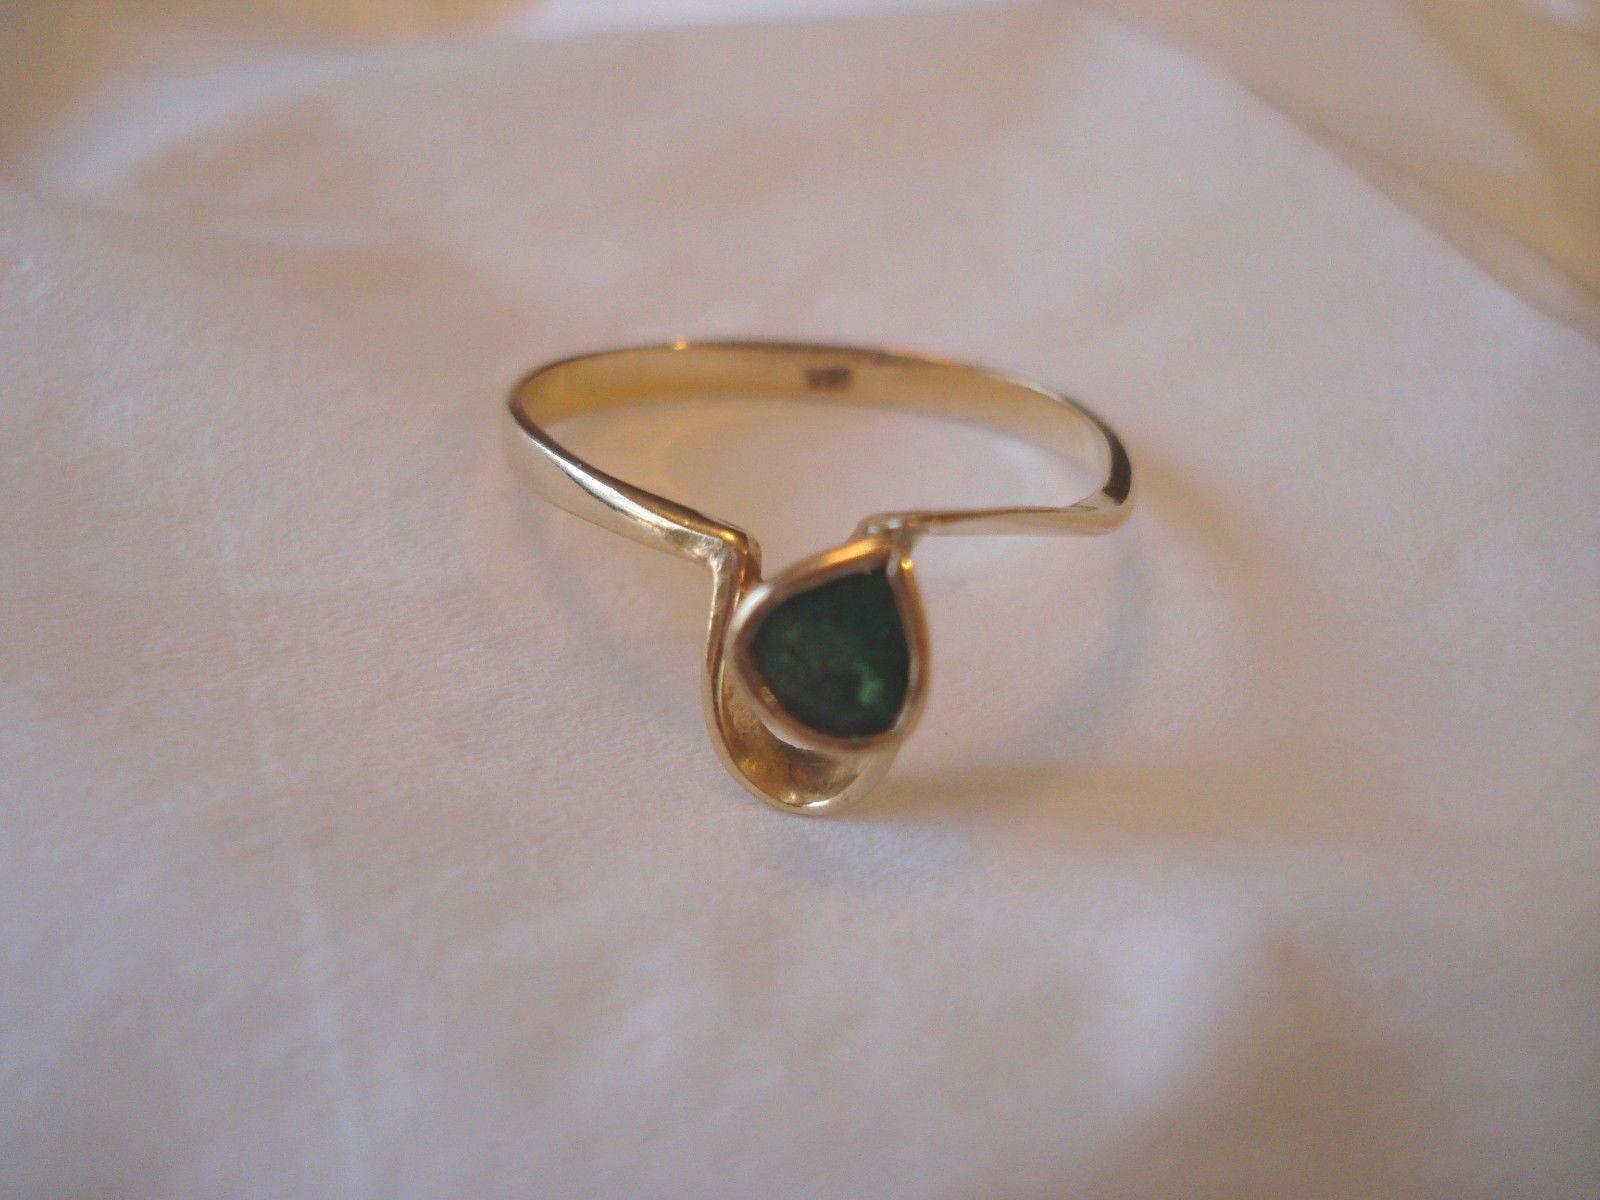 18k Yellow gold Emerald Ring .15 Carat - size 7 - grams 1.7